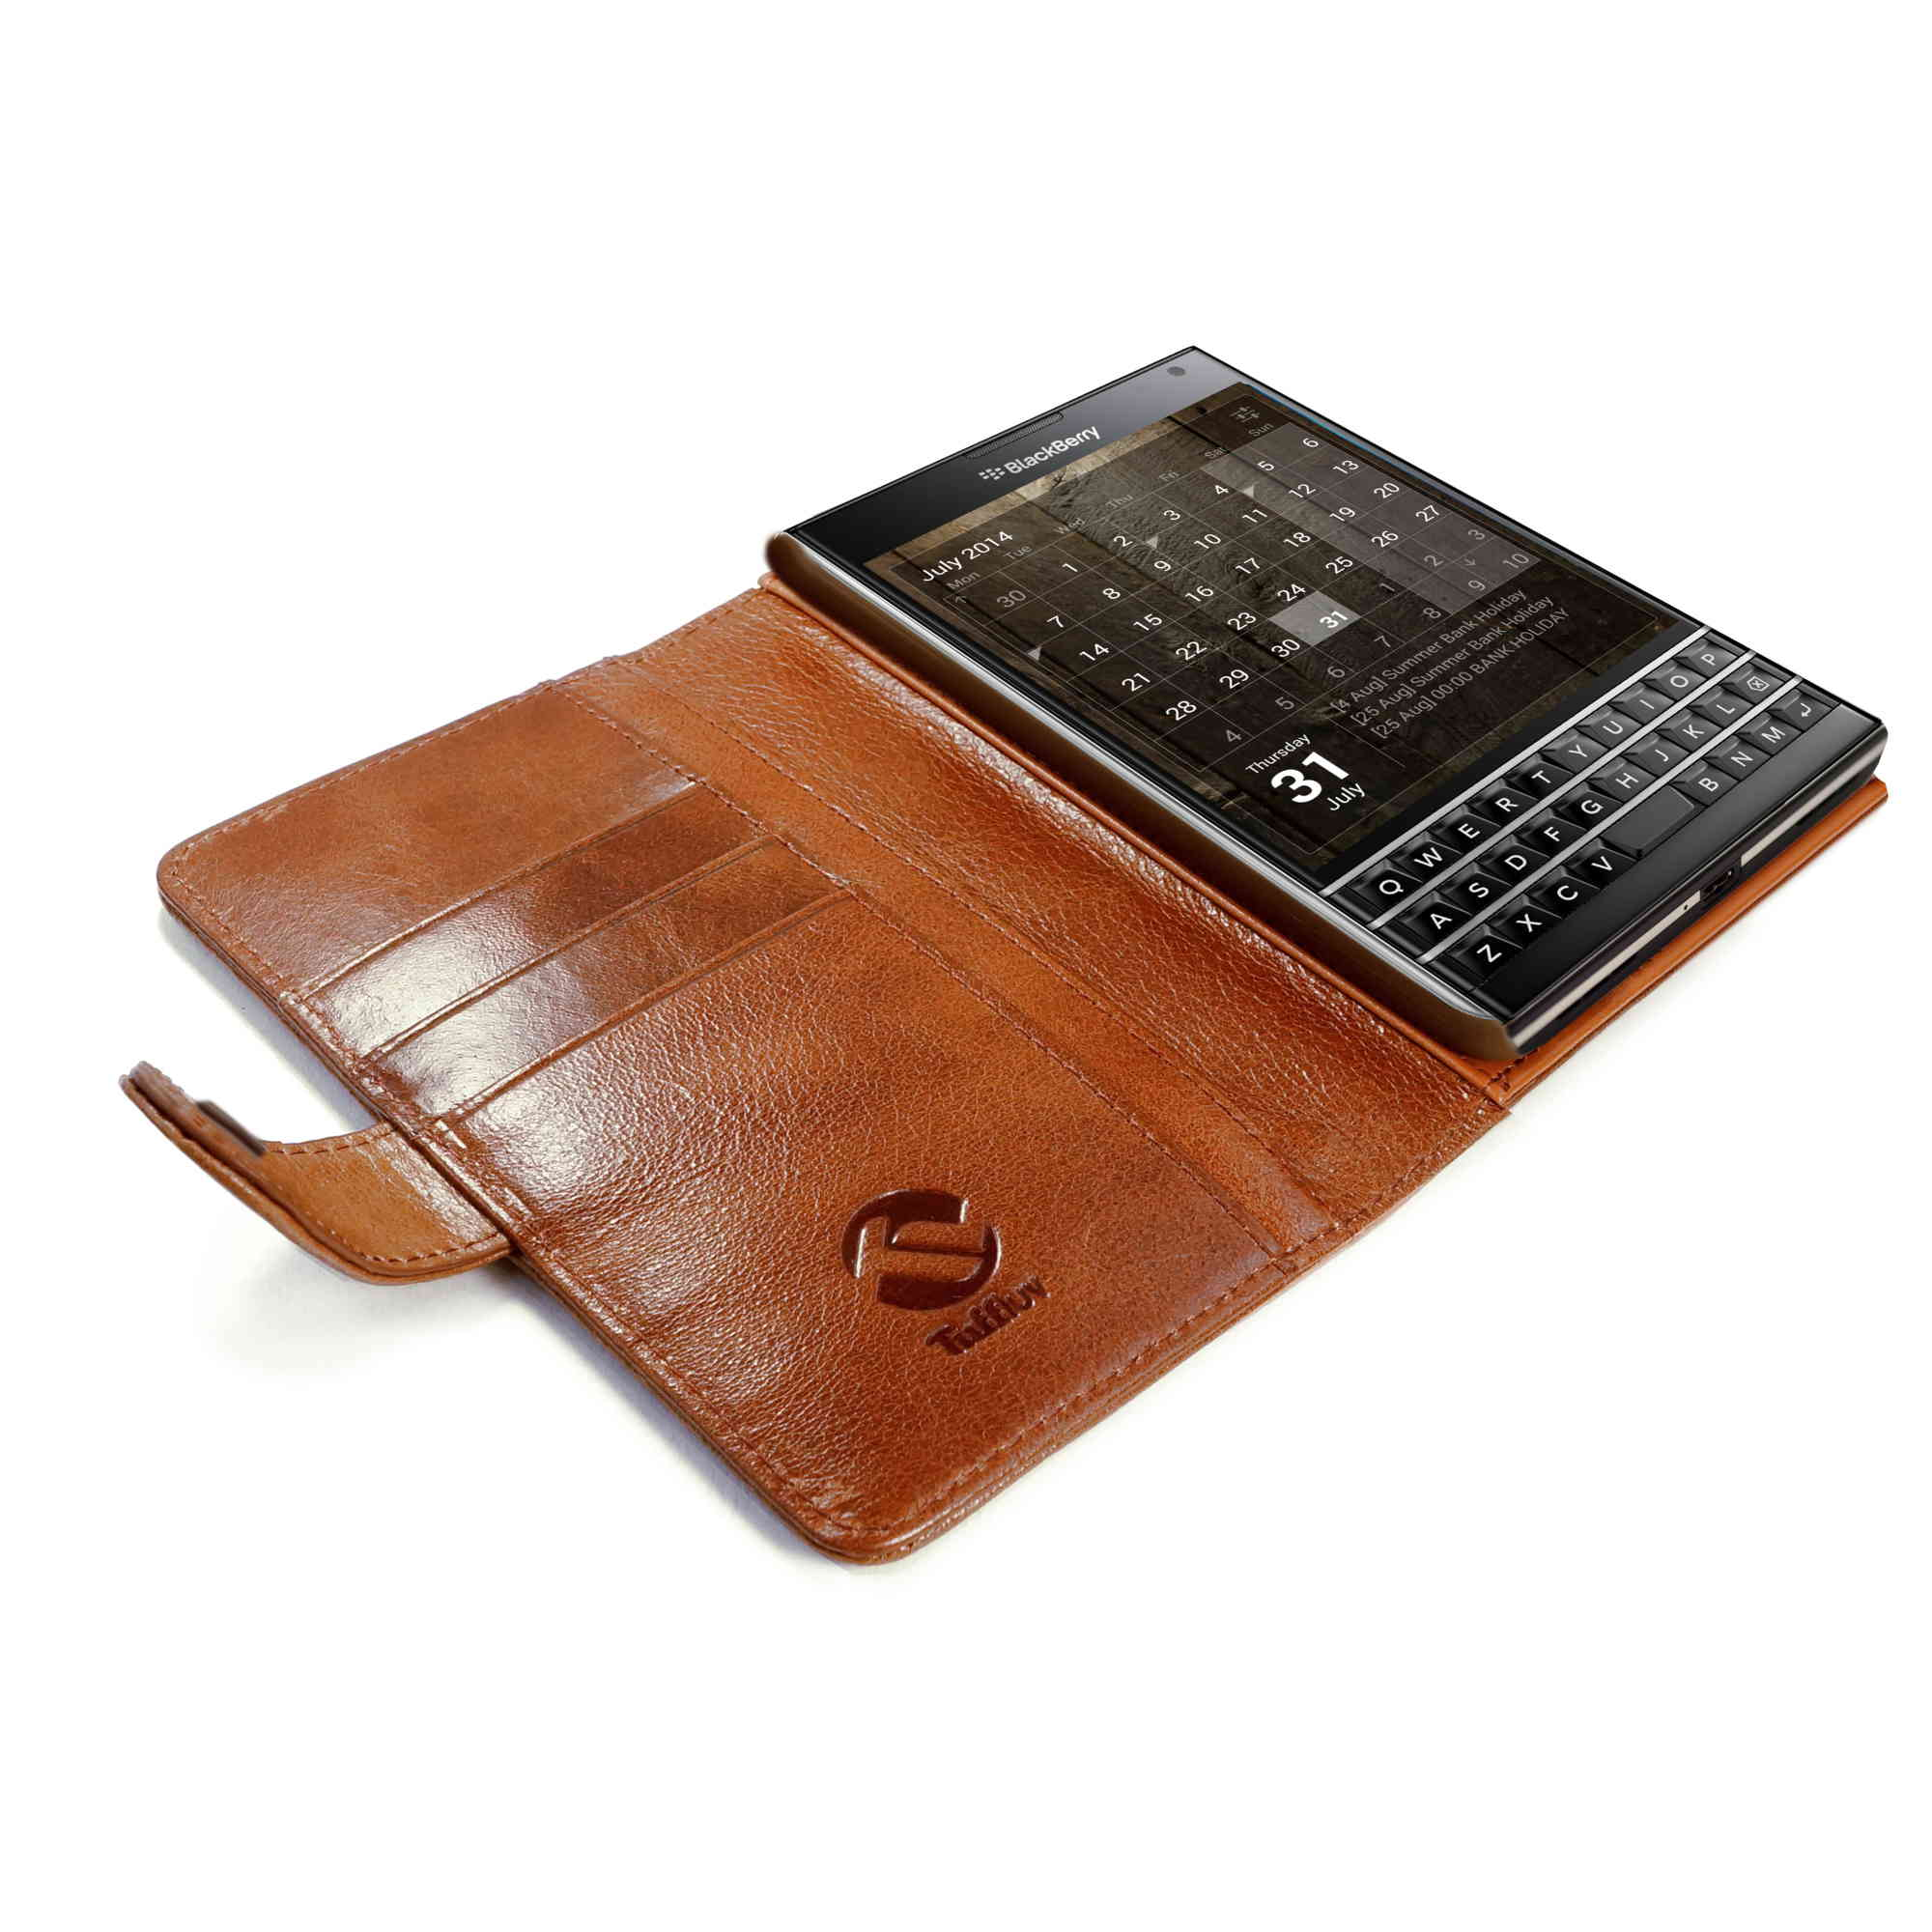 Tuff LUV Vintage Genuine Leather Wallet Case FOR ...